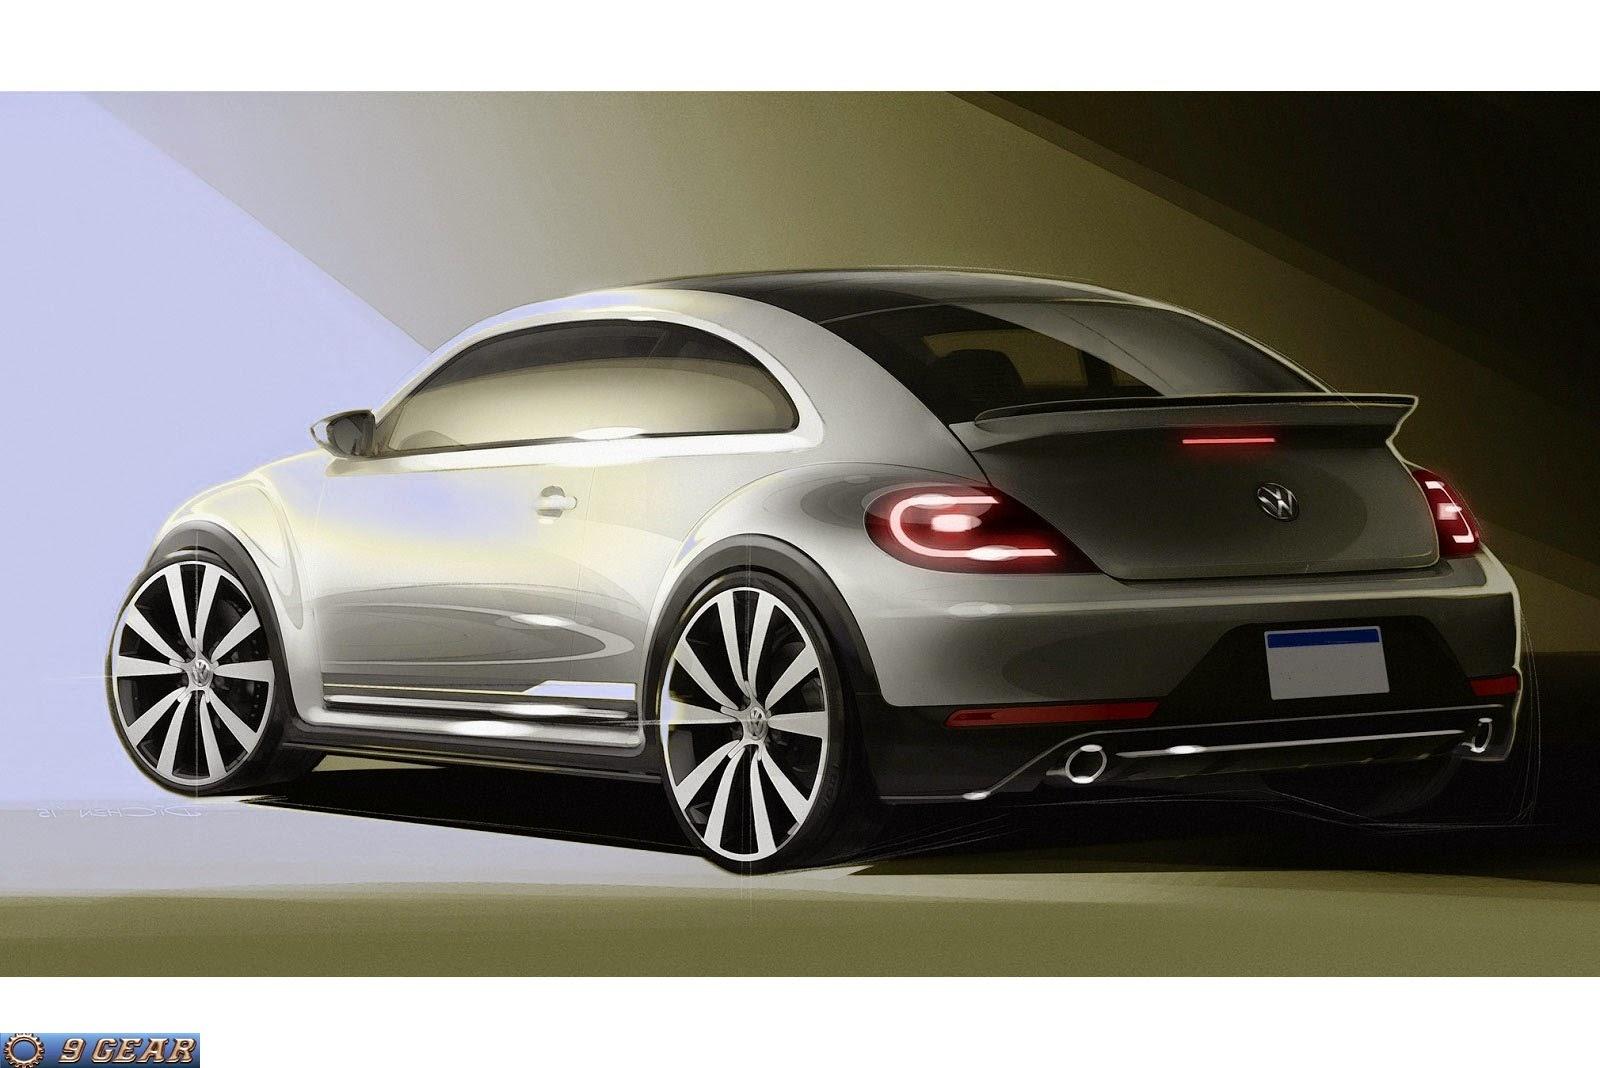 the volkswagen beetle r line concept car reviews new car pictures for 2018 2019. Black Bedroom Furniture Sets. Home Design Ideas